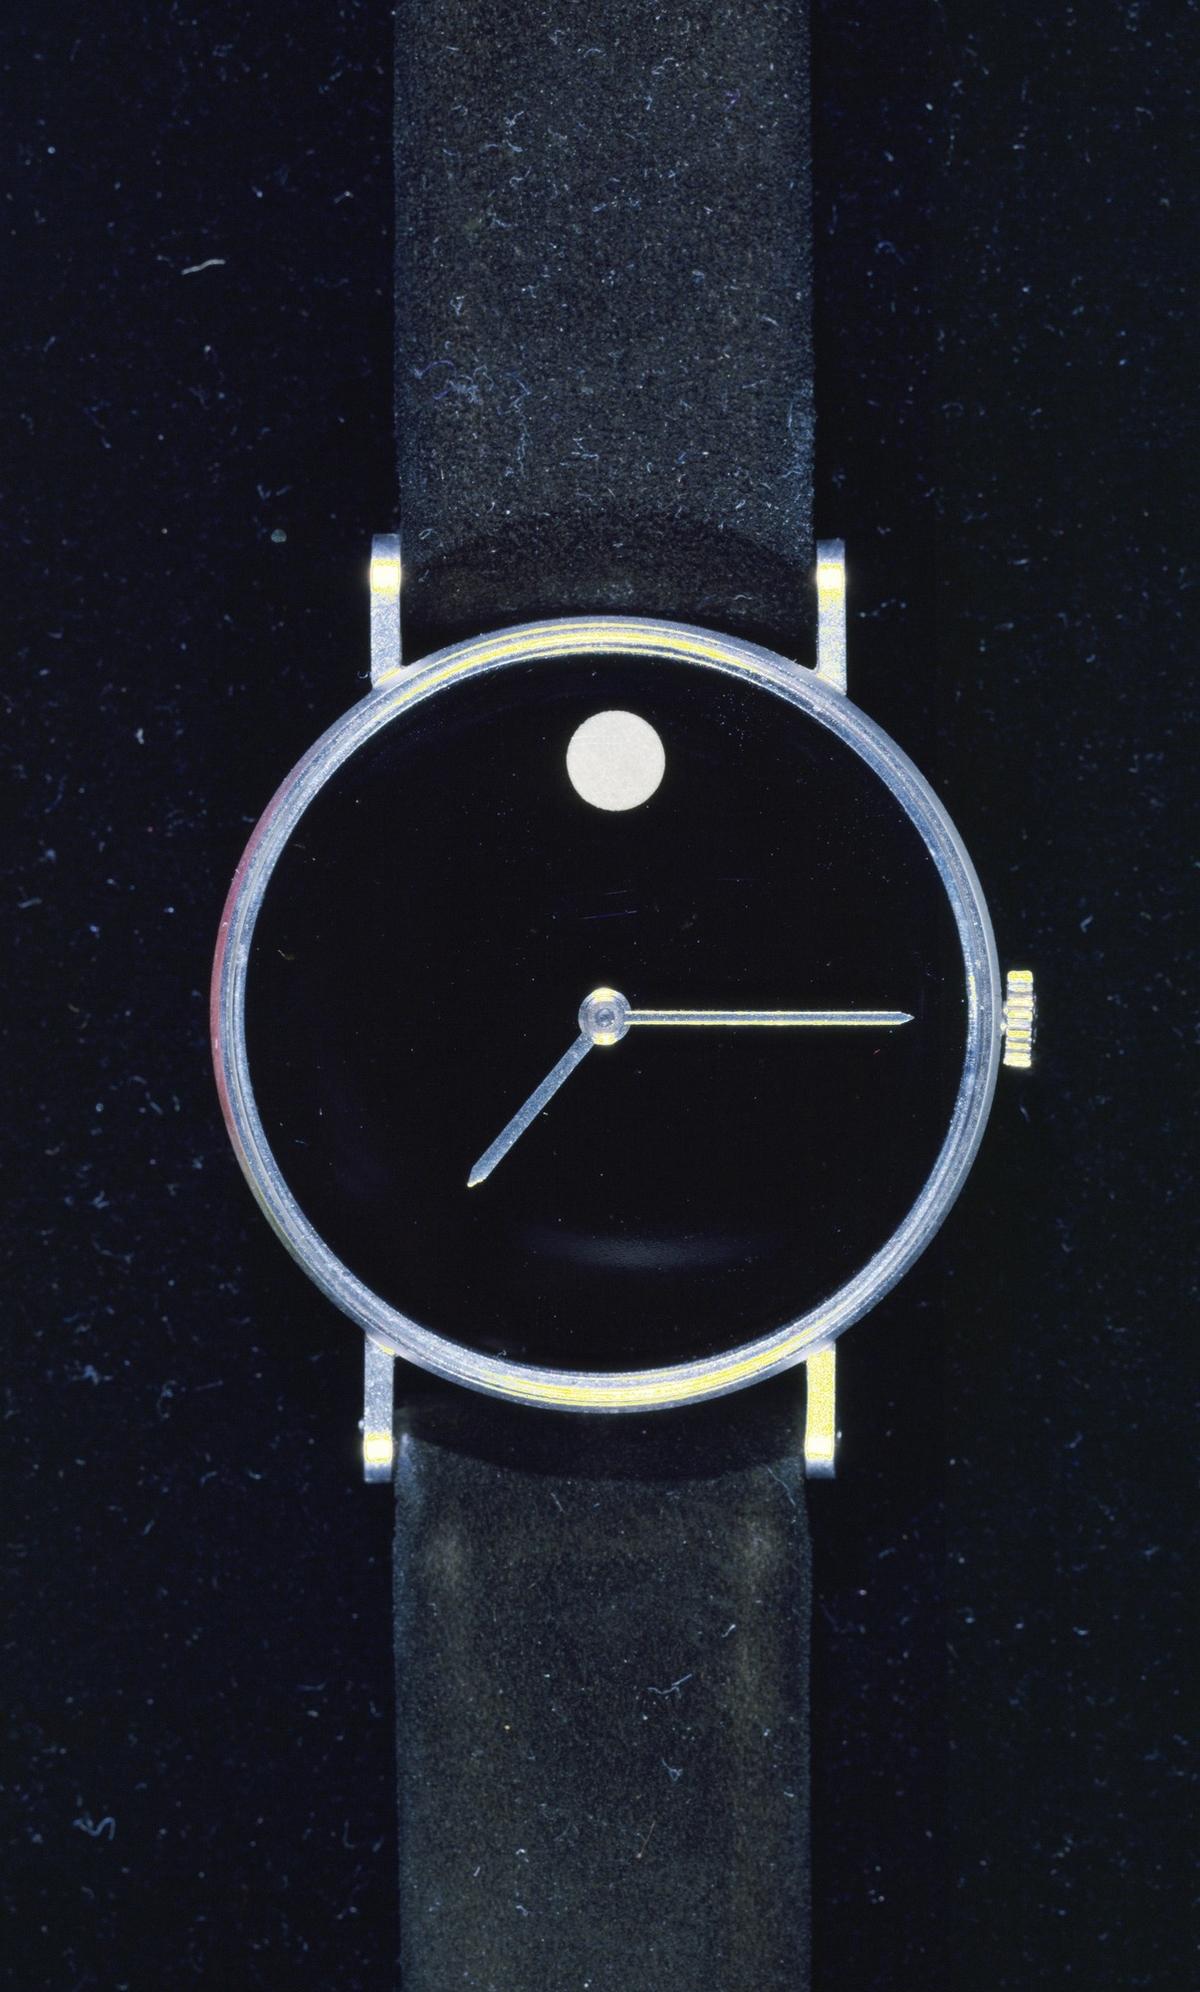 Roger Dubuis黑裝新作!穿越黑暗的時間美學